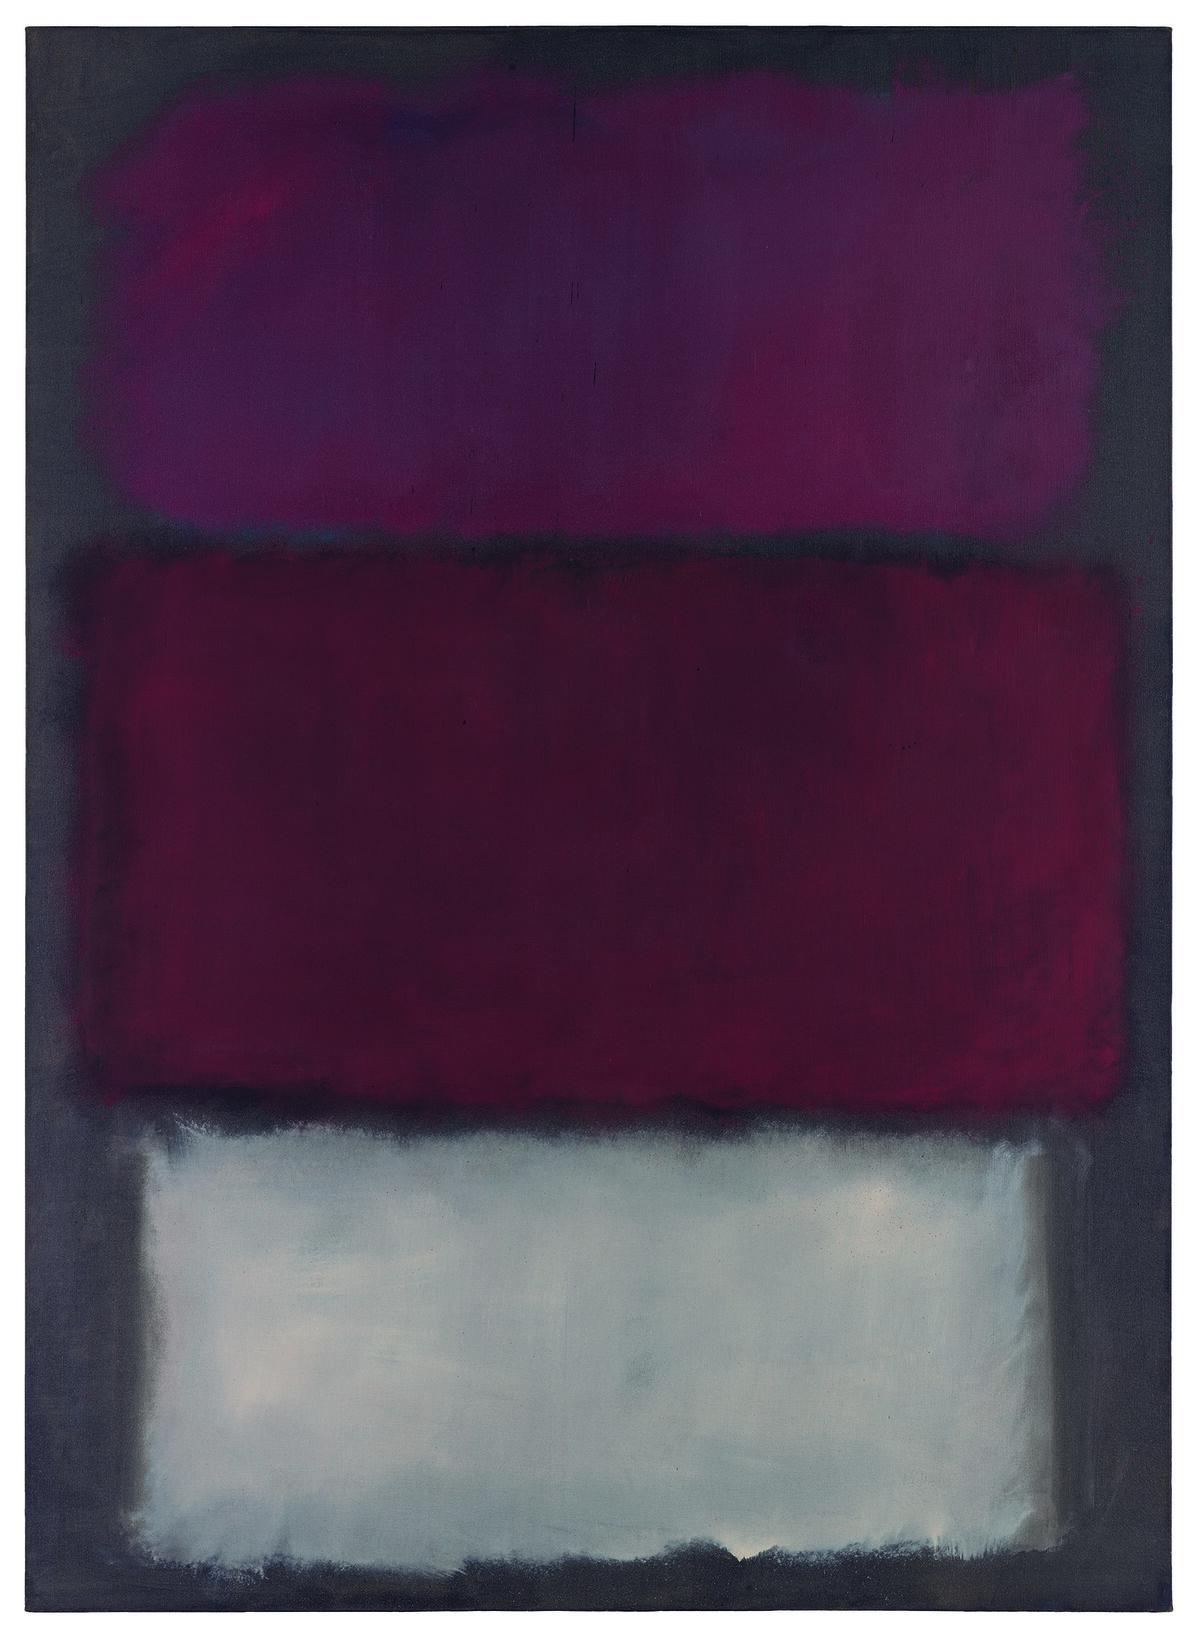 Mark Rothko, Untitled, 1960. Courtesy Sotheby's.